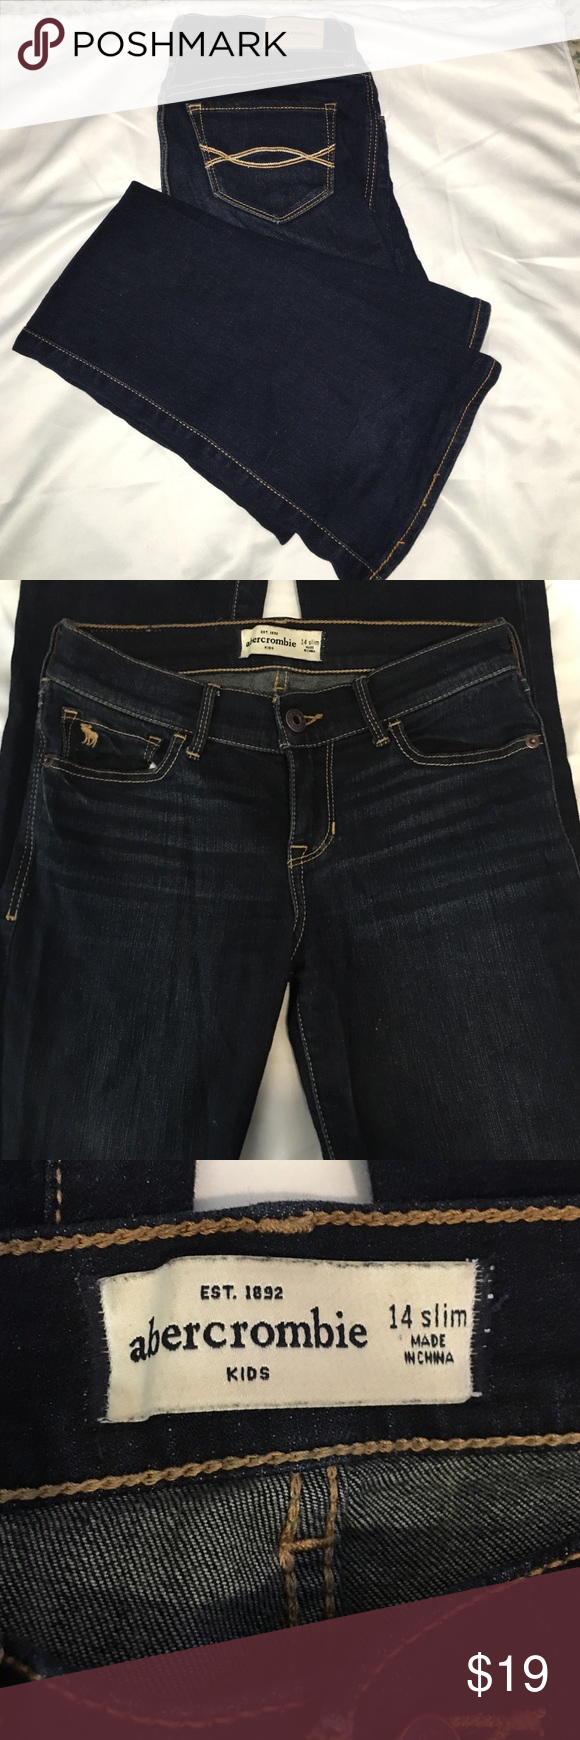 Abercrombie Girls jeans 14 slim Dark wash girls denim boot cut Jean by Abercrombie size 14 slim abercrombie kids Jeans Boot Cut